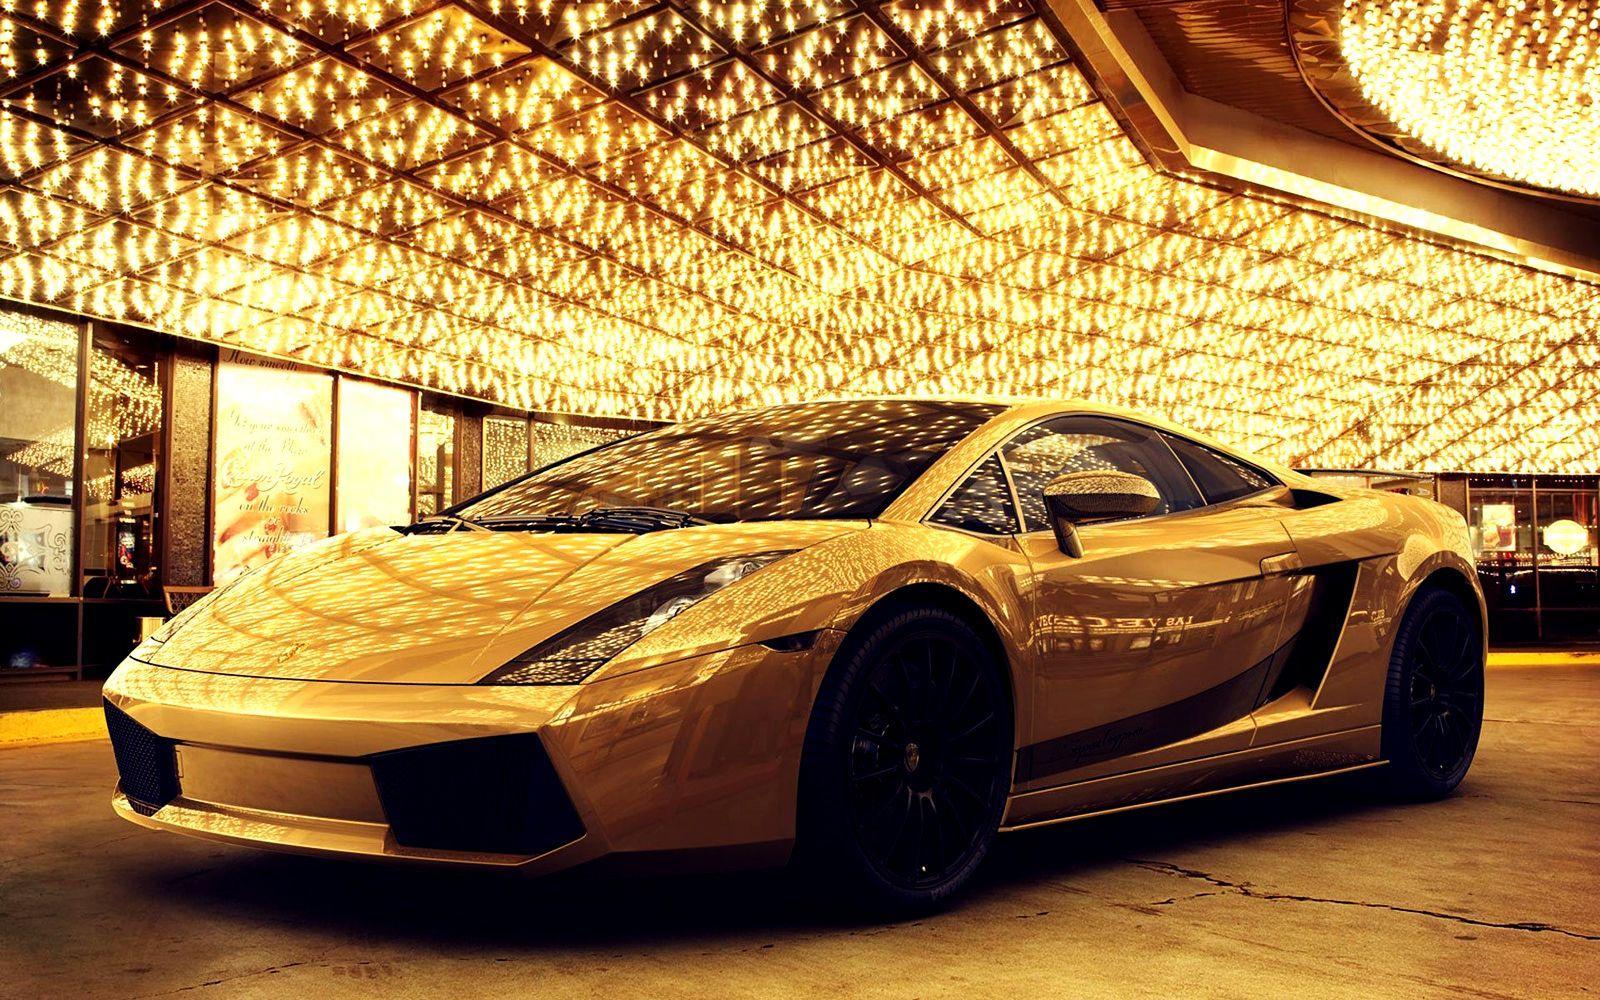 Wallpaper Golden Cool Cars Best Cars Wallpapers